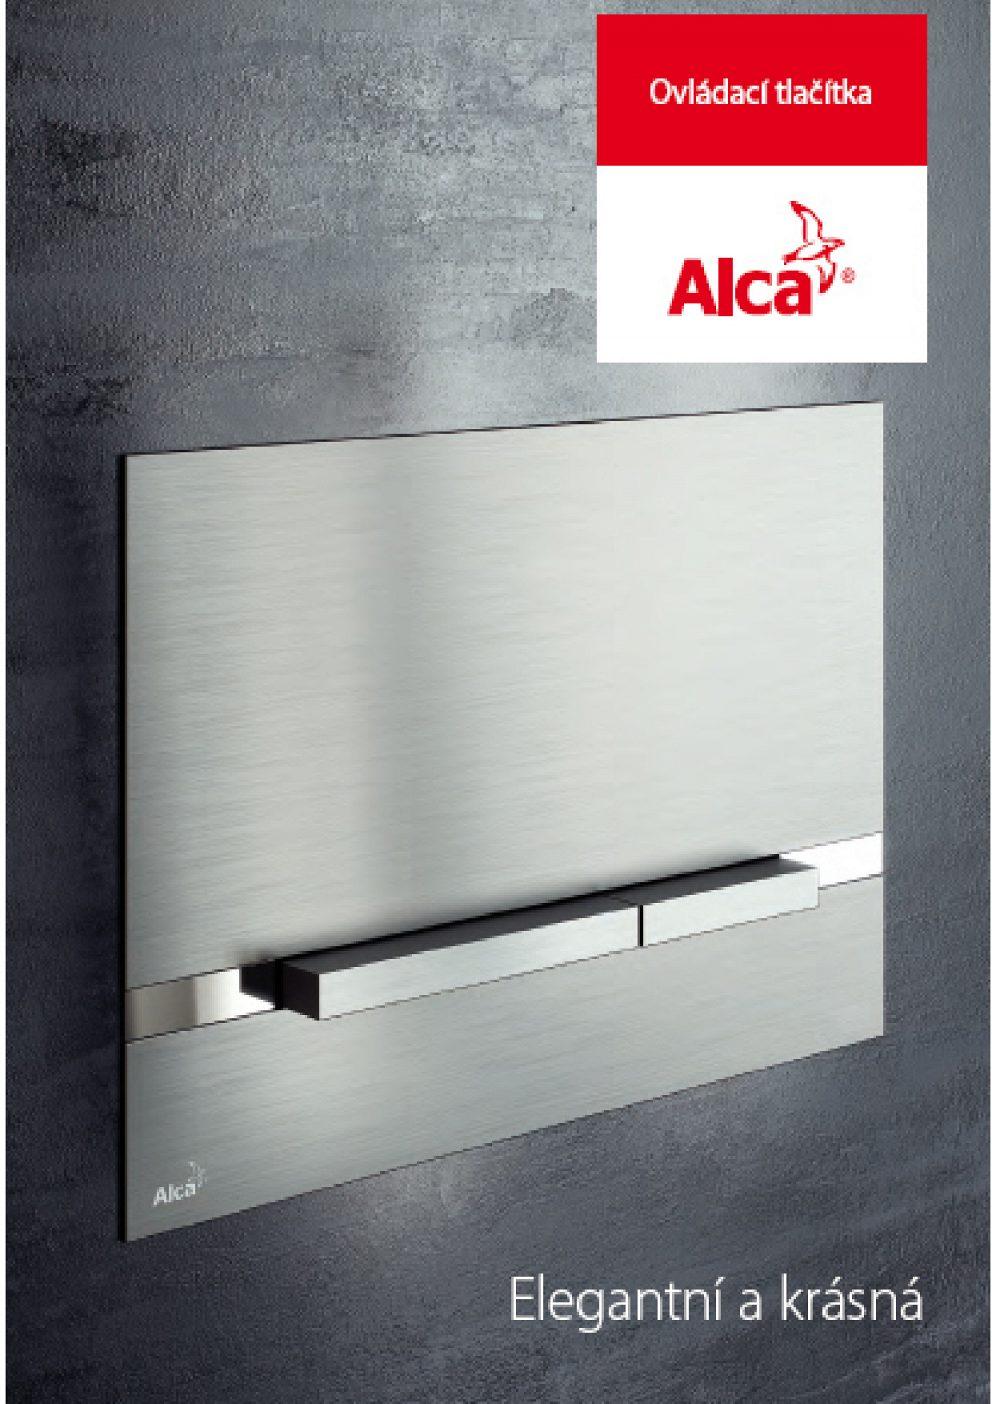 AlcaPlast - Ovládacie tlačítka